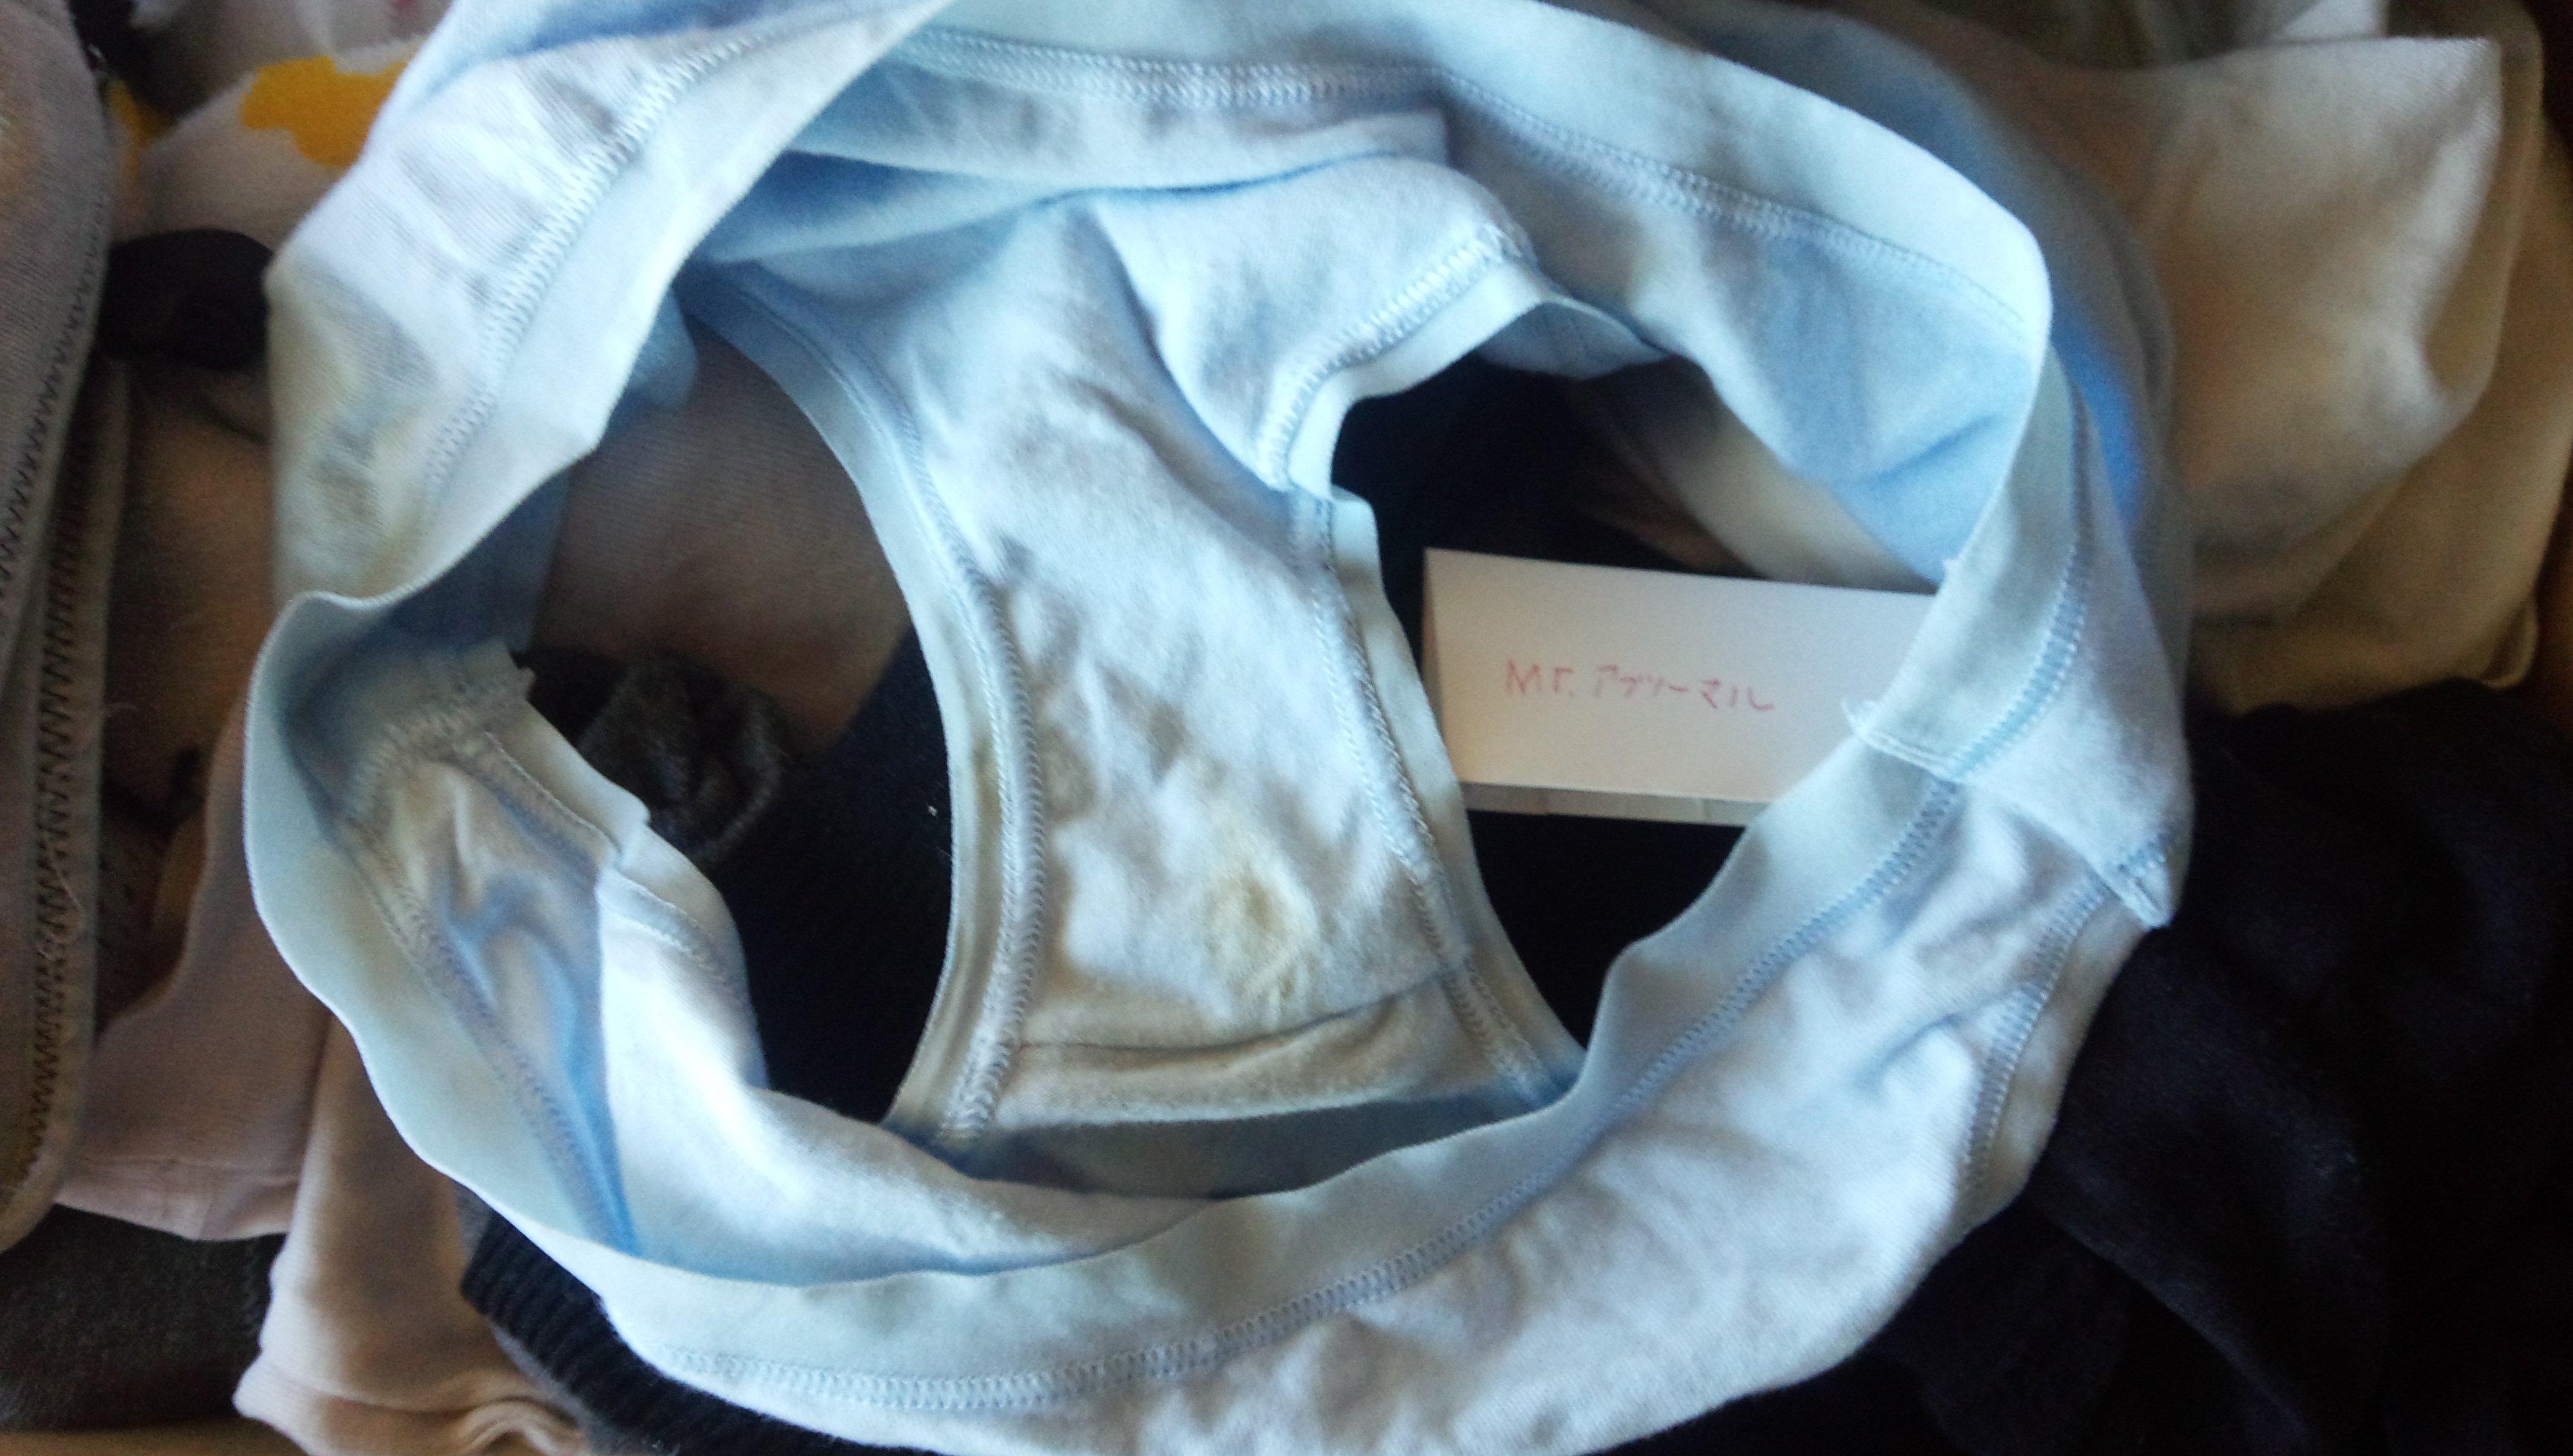 jk妹のロリパンツを盗撮パンコキ射精した下着エロ画像13枚目